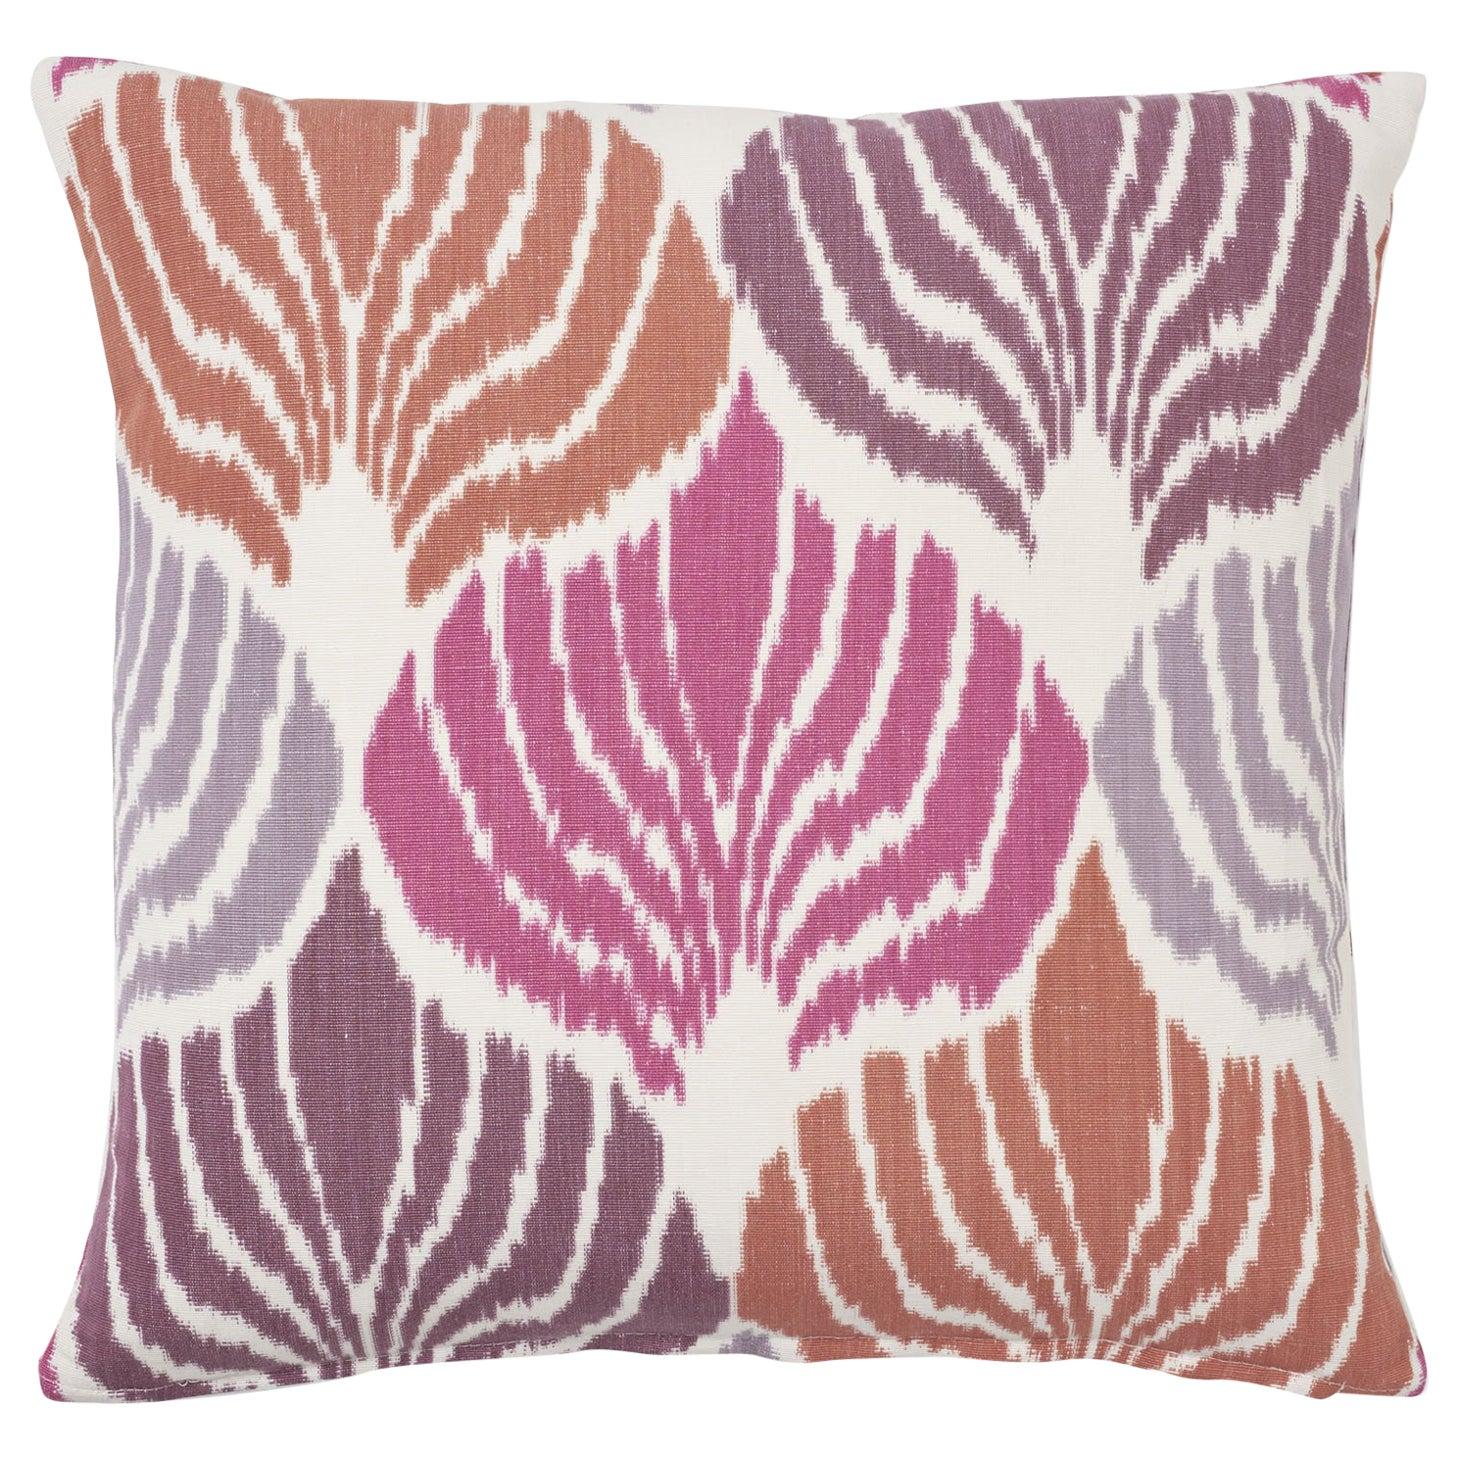 Schumacher Kimono Ikat Berry Two-Sided Linen Cotton Pillow